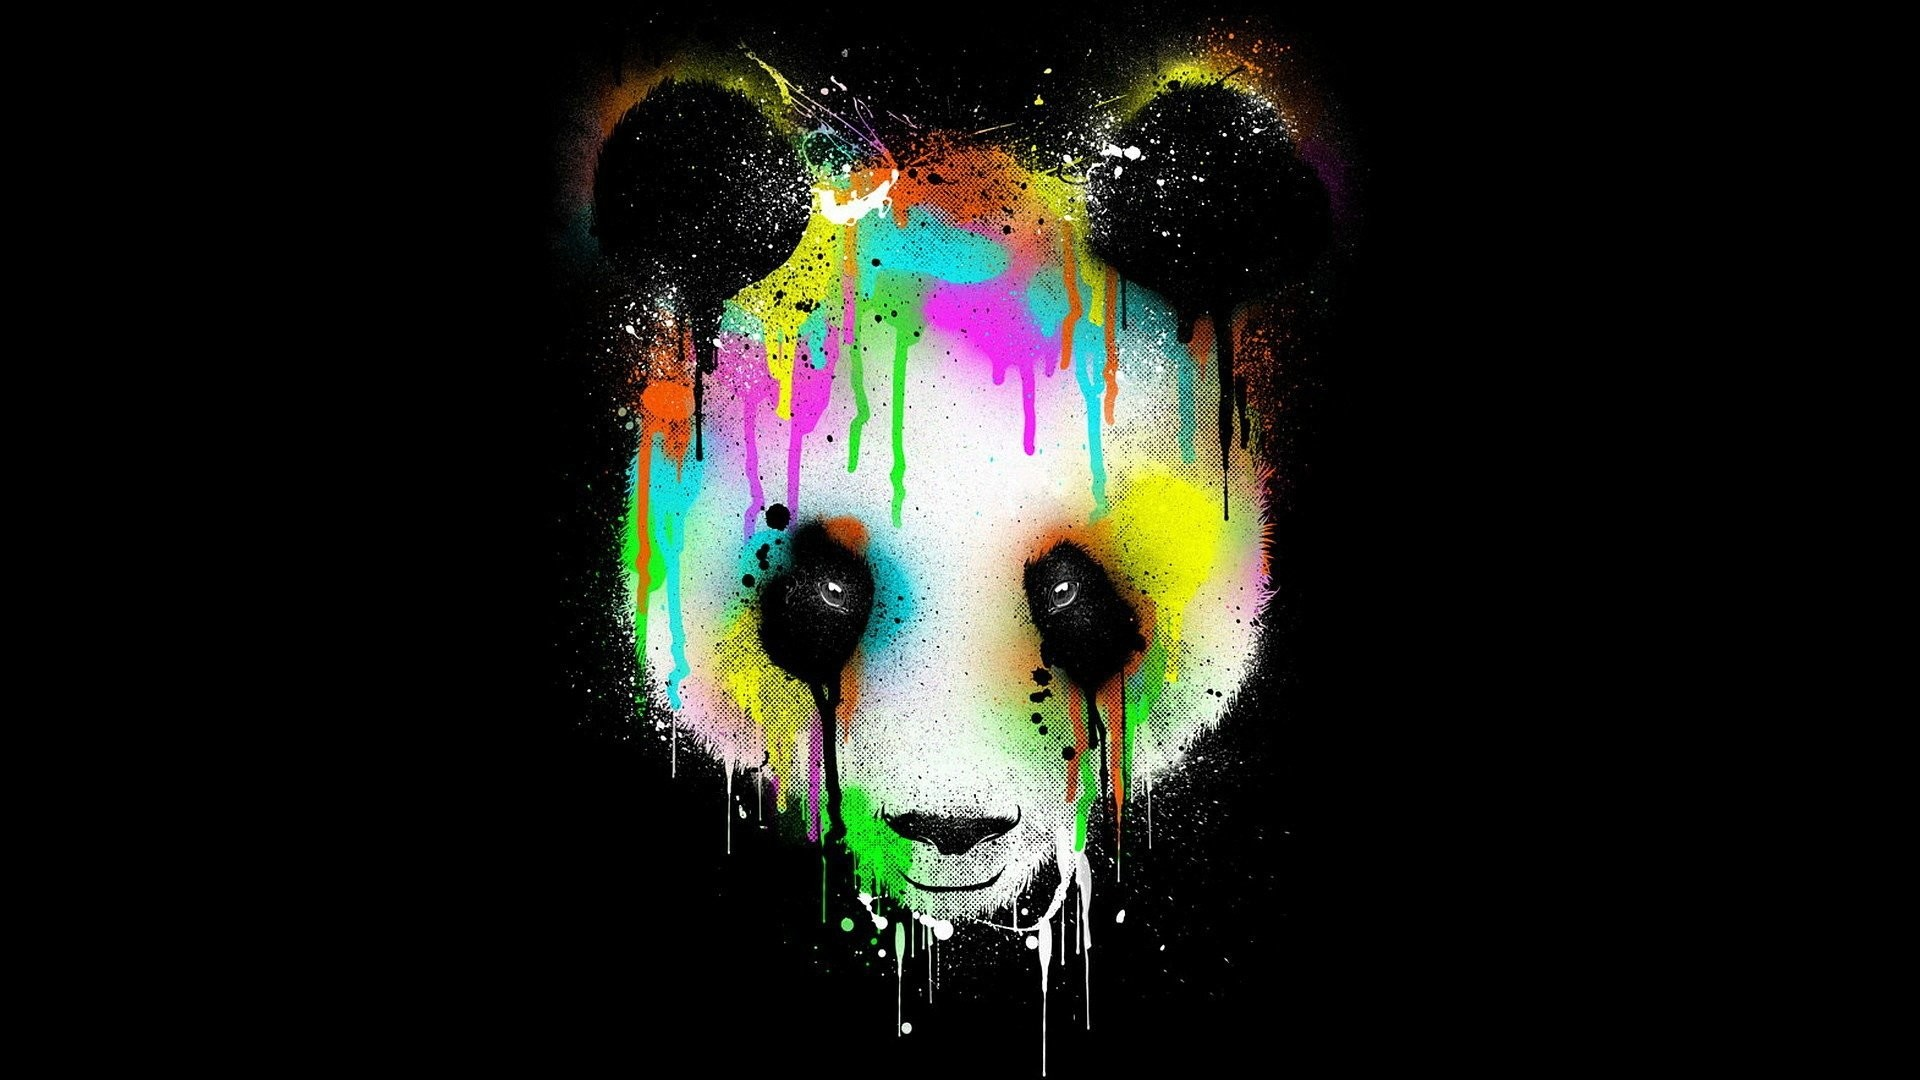 Fondo de pantalla HD   Fondo de Escritorio ID:524941. Animales  Panda